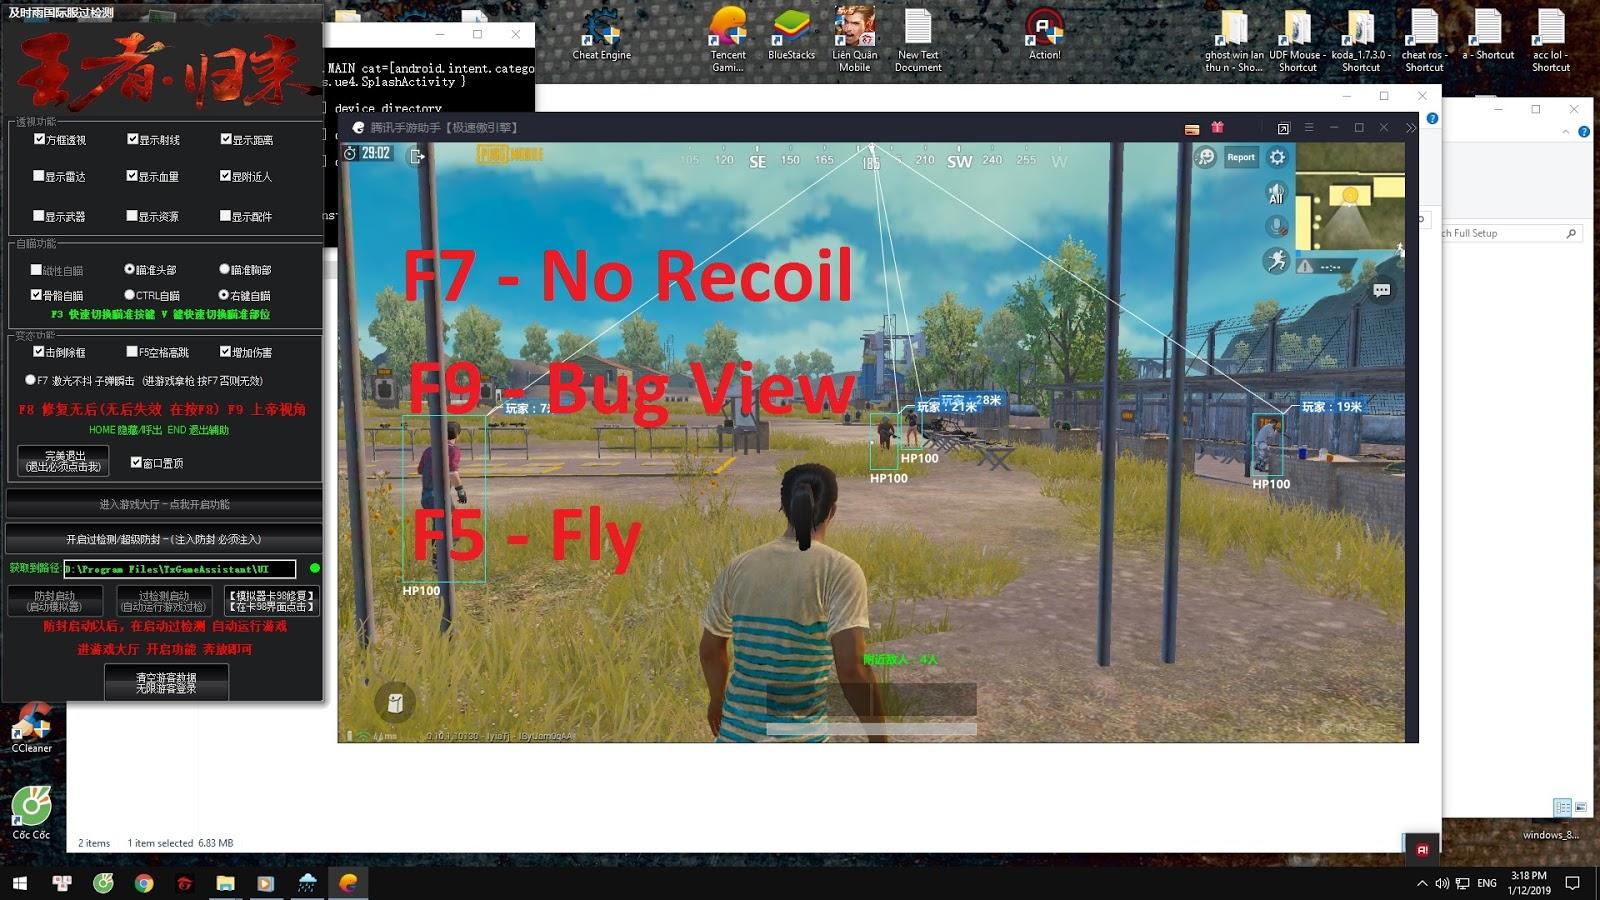 Hack Pubg Mobile Tencent Vip Crack Esp Fly Aimbot Bug View